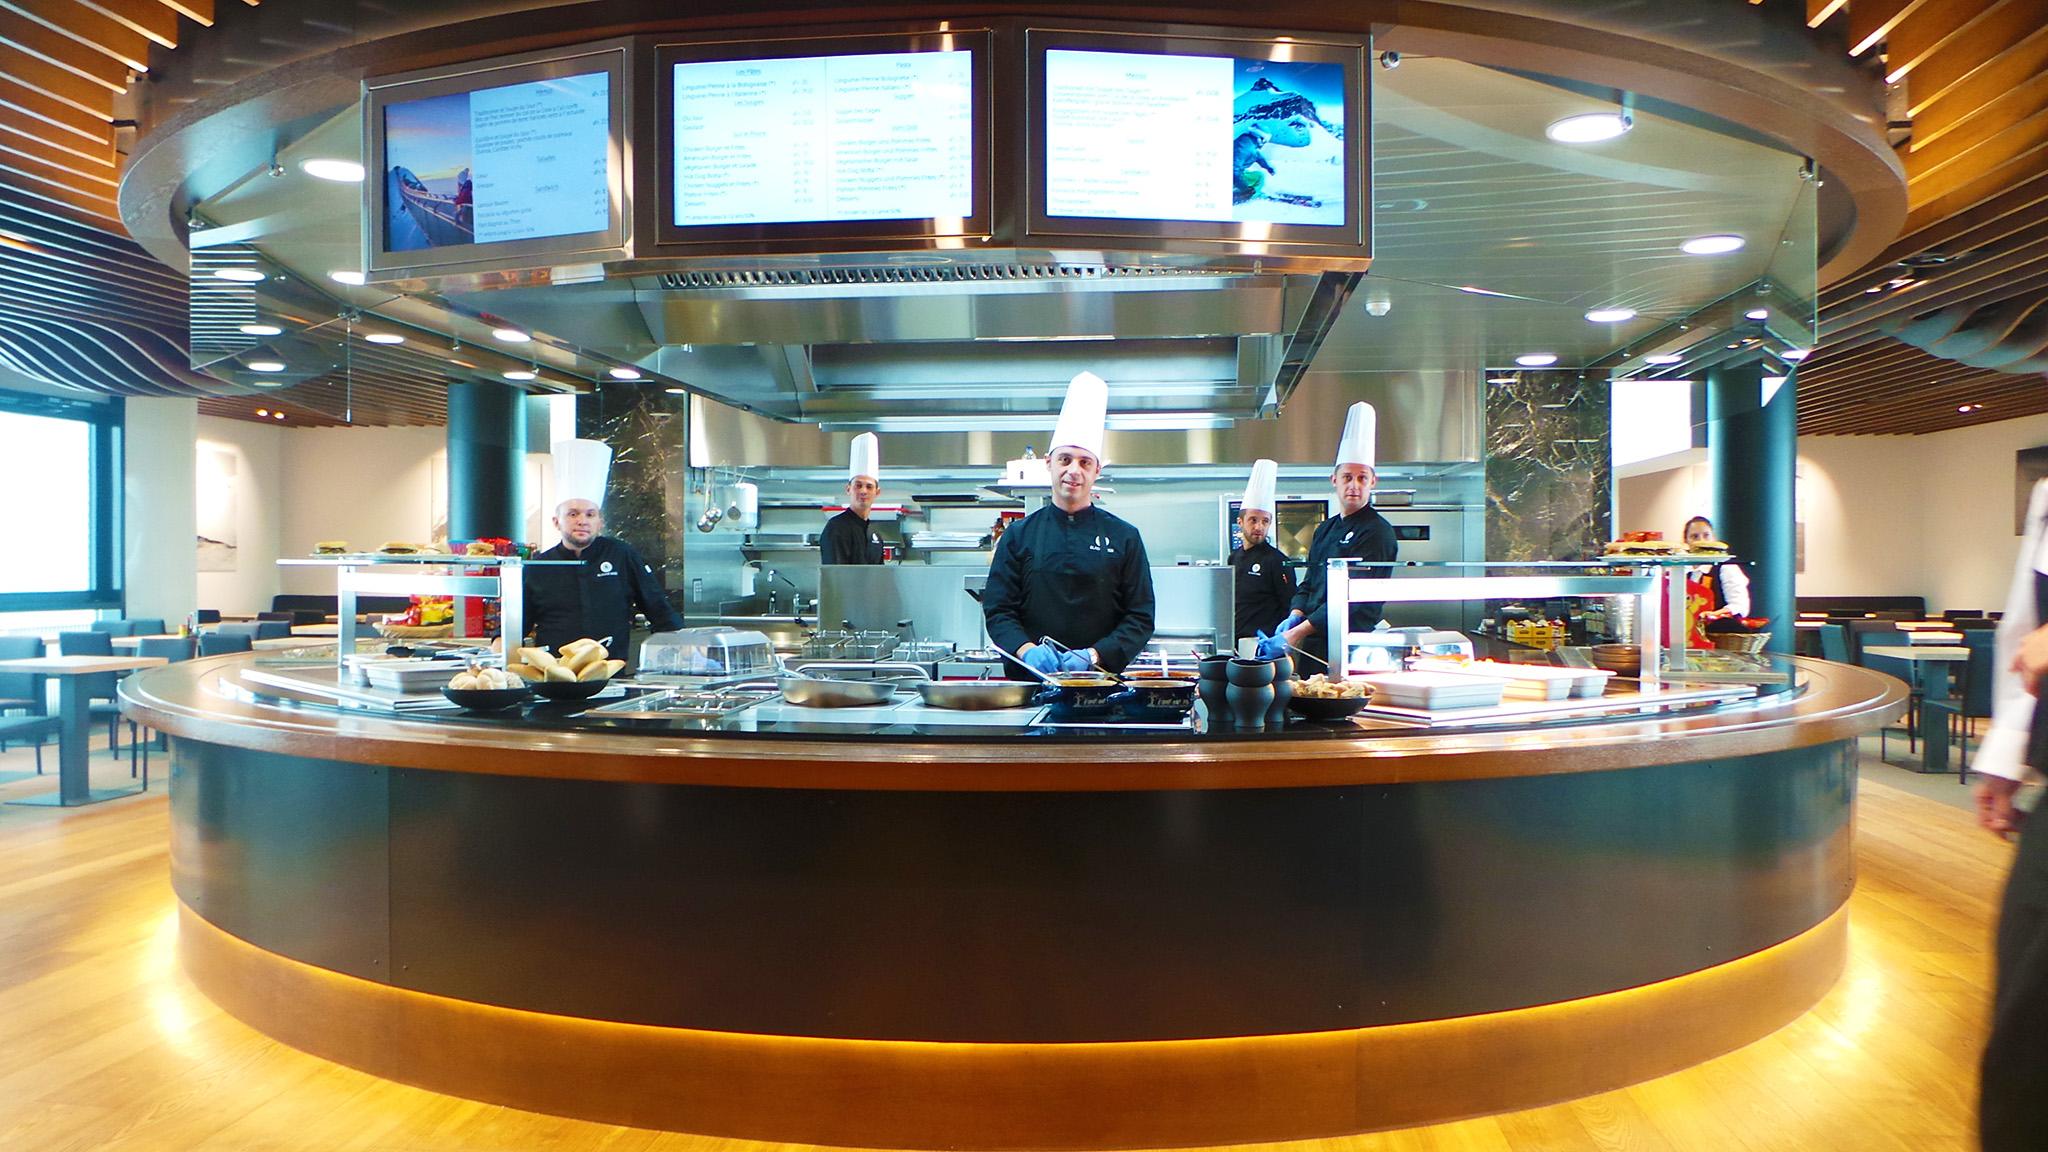 kt_2020_320_Keytours_excursions_Swisstours_glacier3000_restaurant1_2048_10